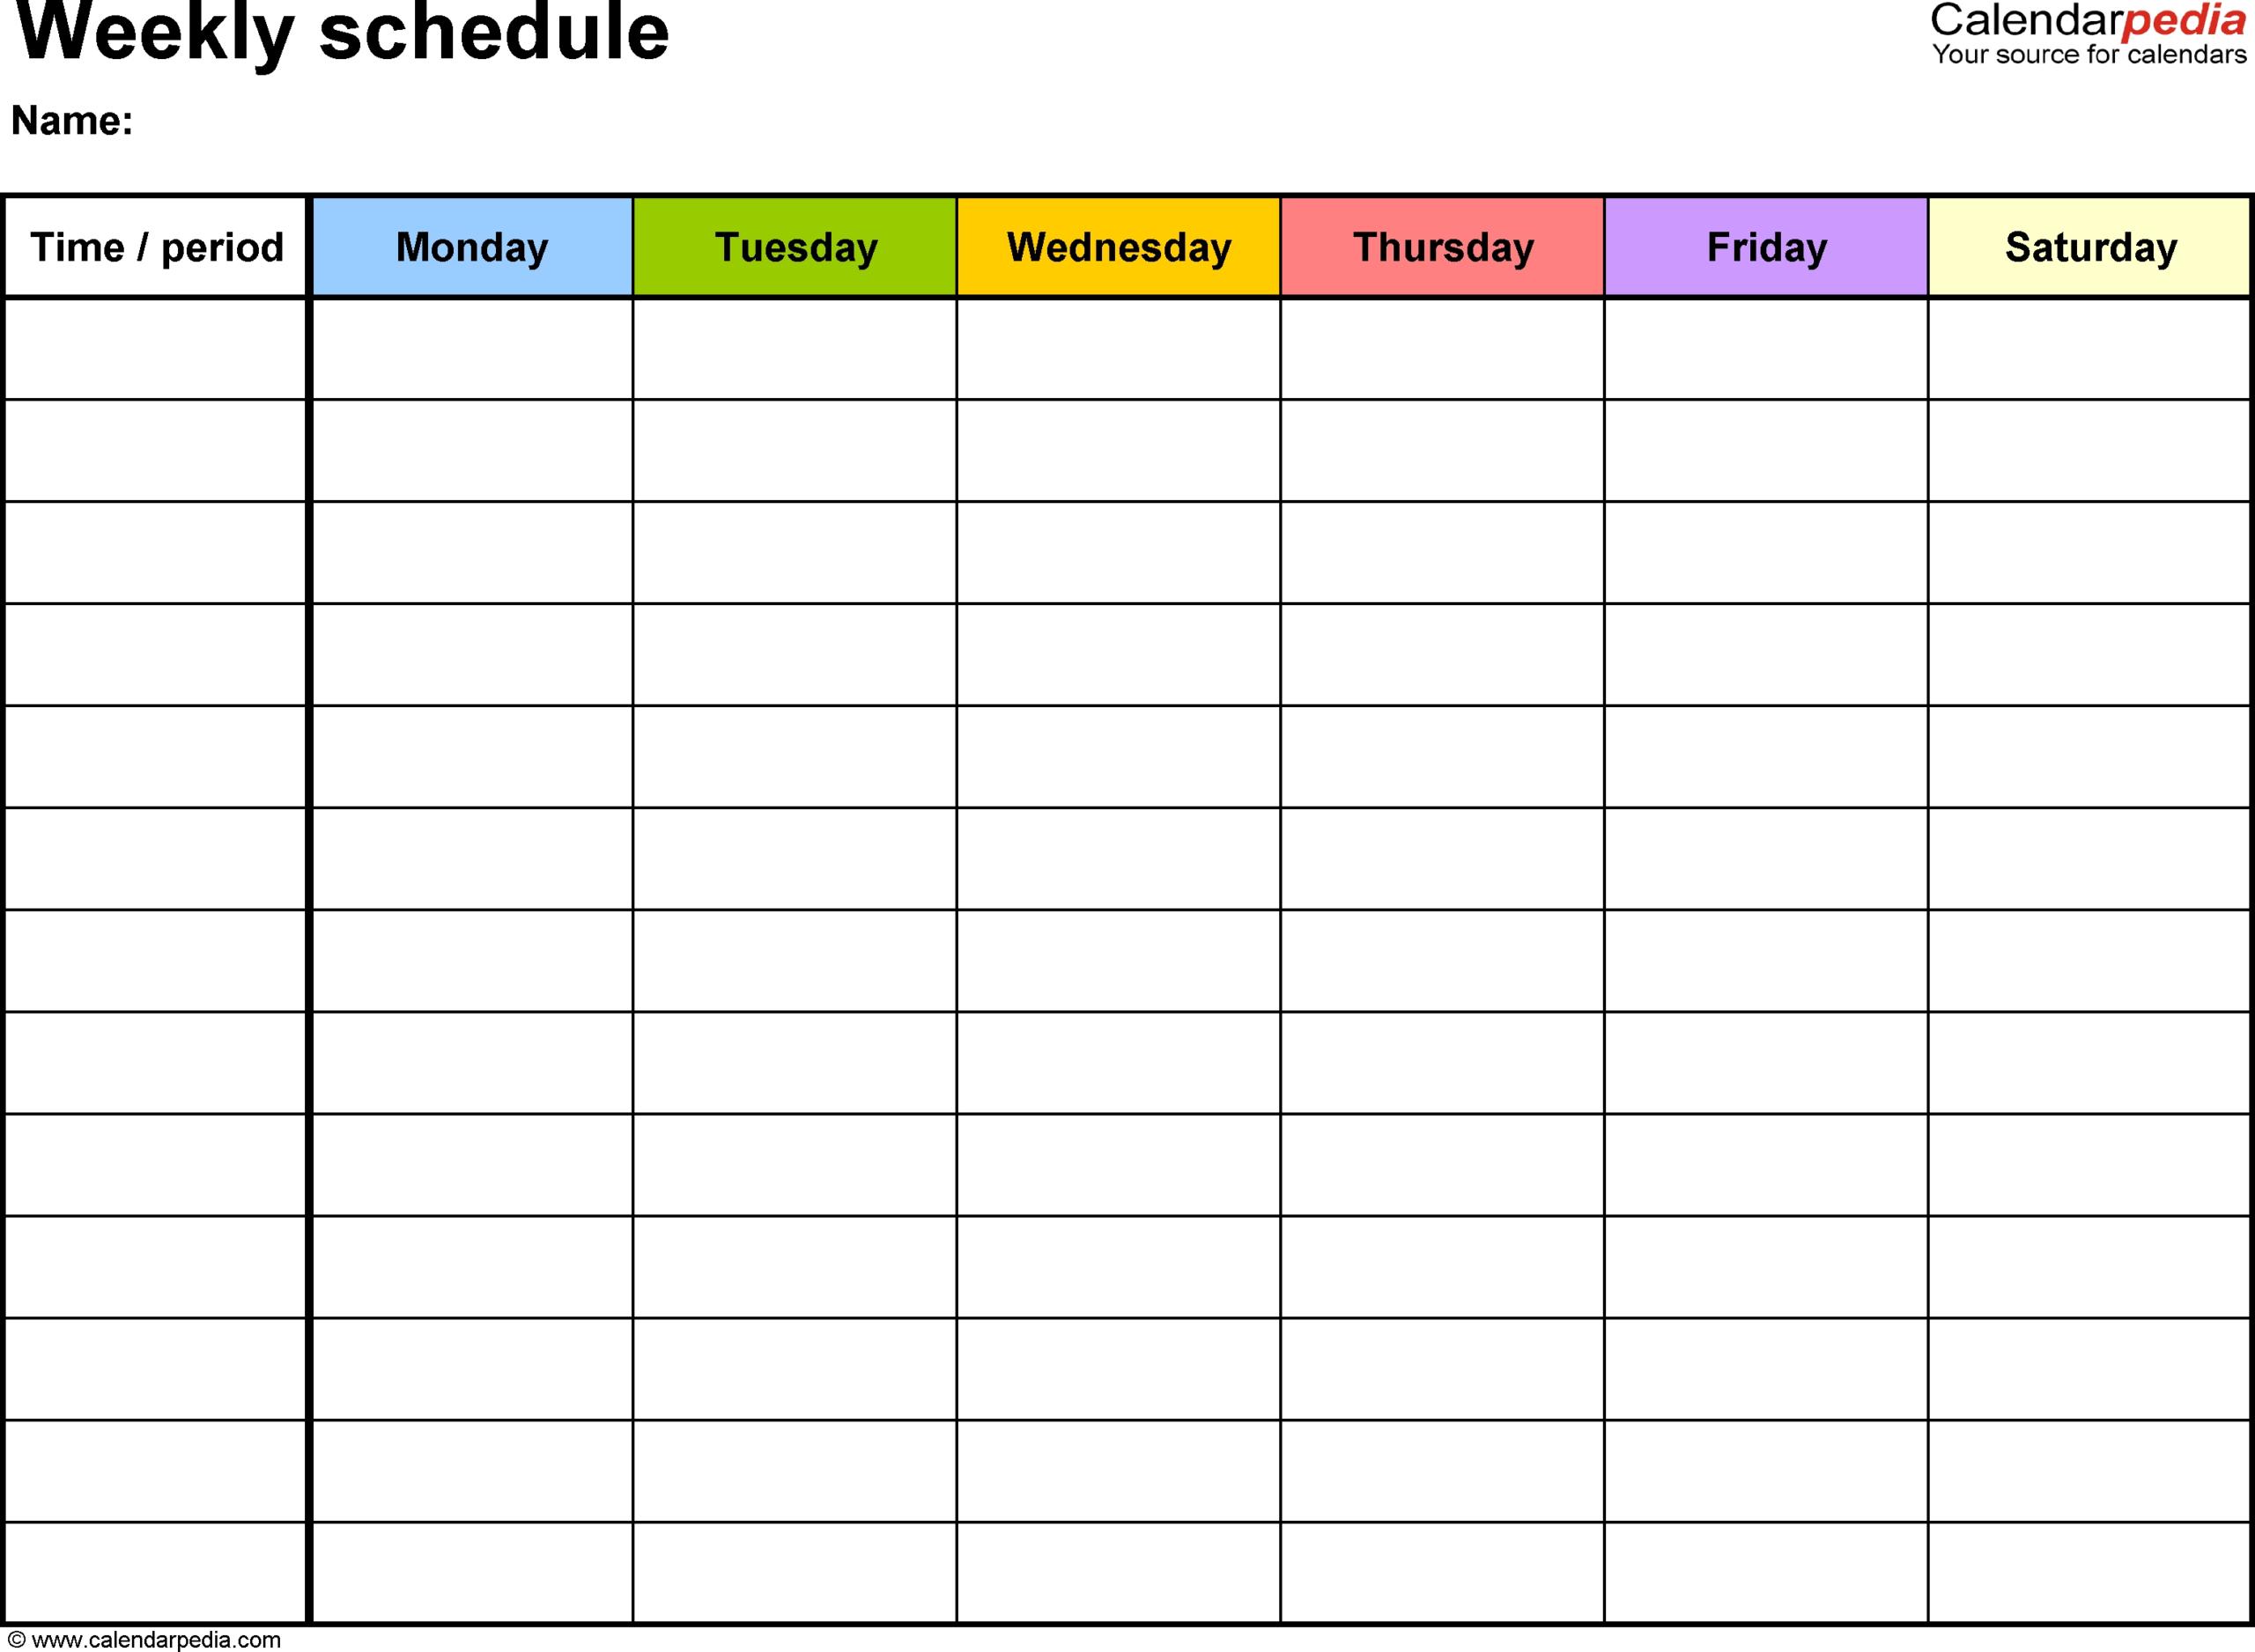 Blank Monday Through Friday Calendars | Calendar Template throughout Free Monday Through Friday Calendar Template